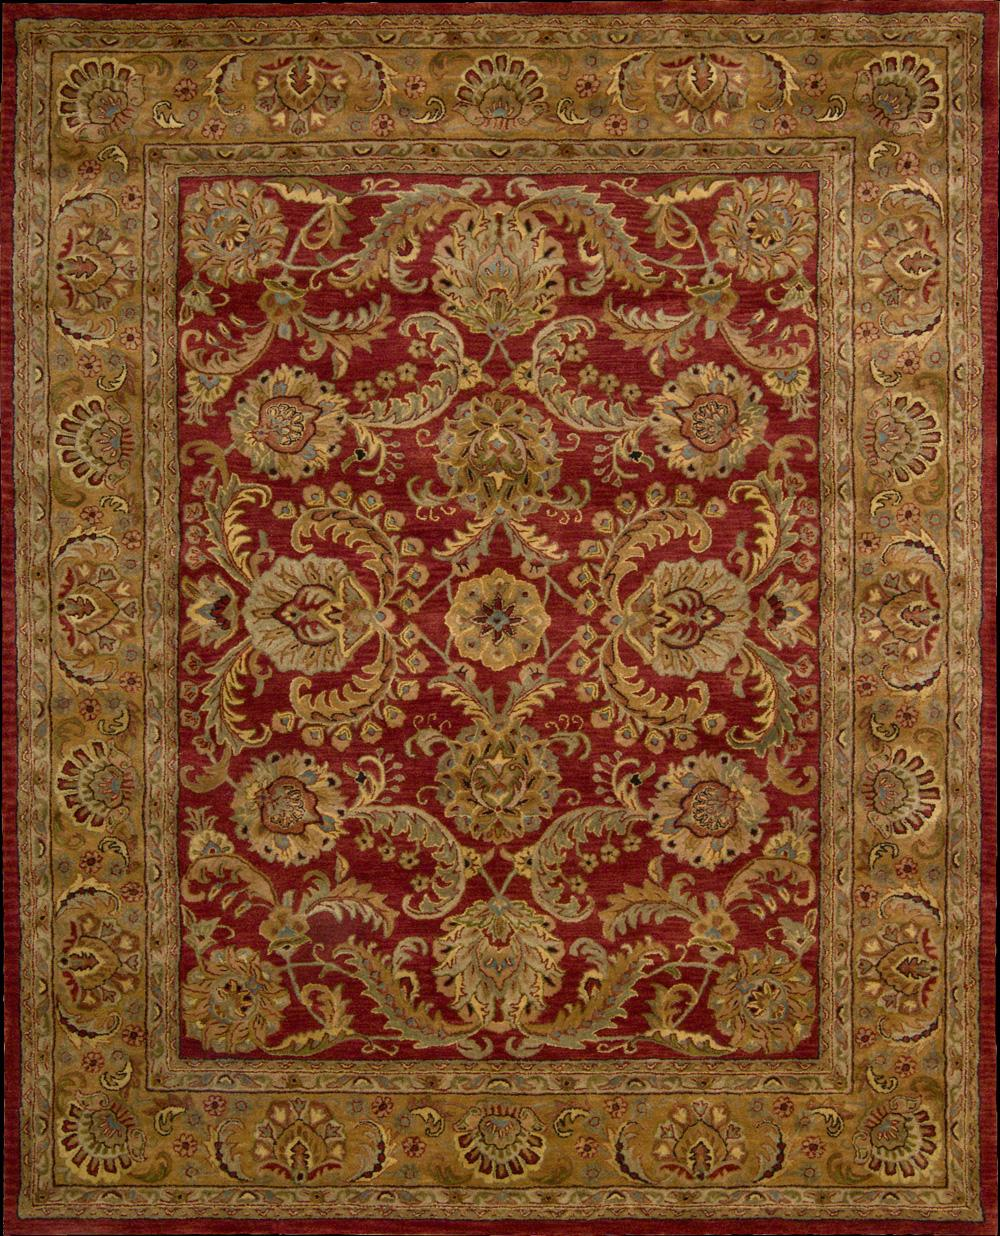 "Nourison Jaipur Area Rug 7'9"" x 9'9"" - Item Number: 49848"